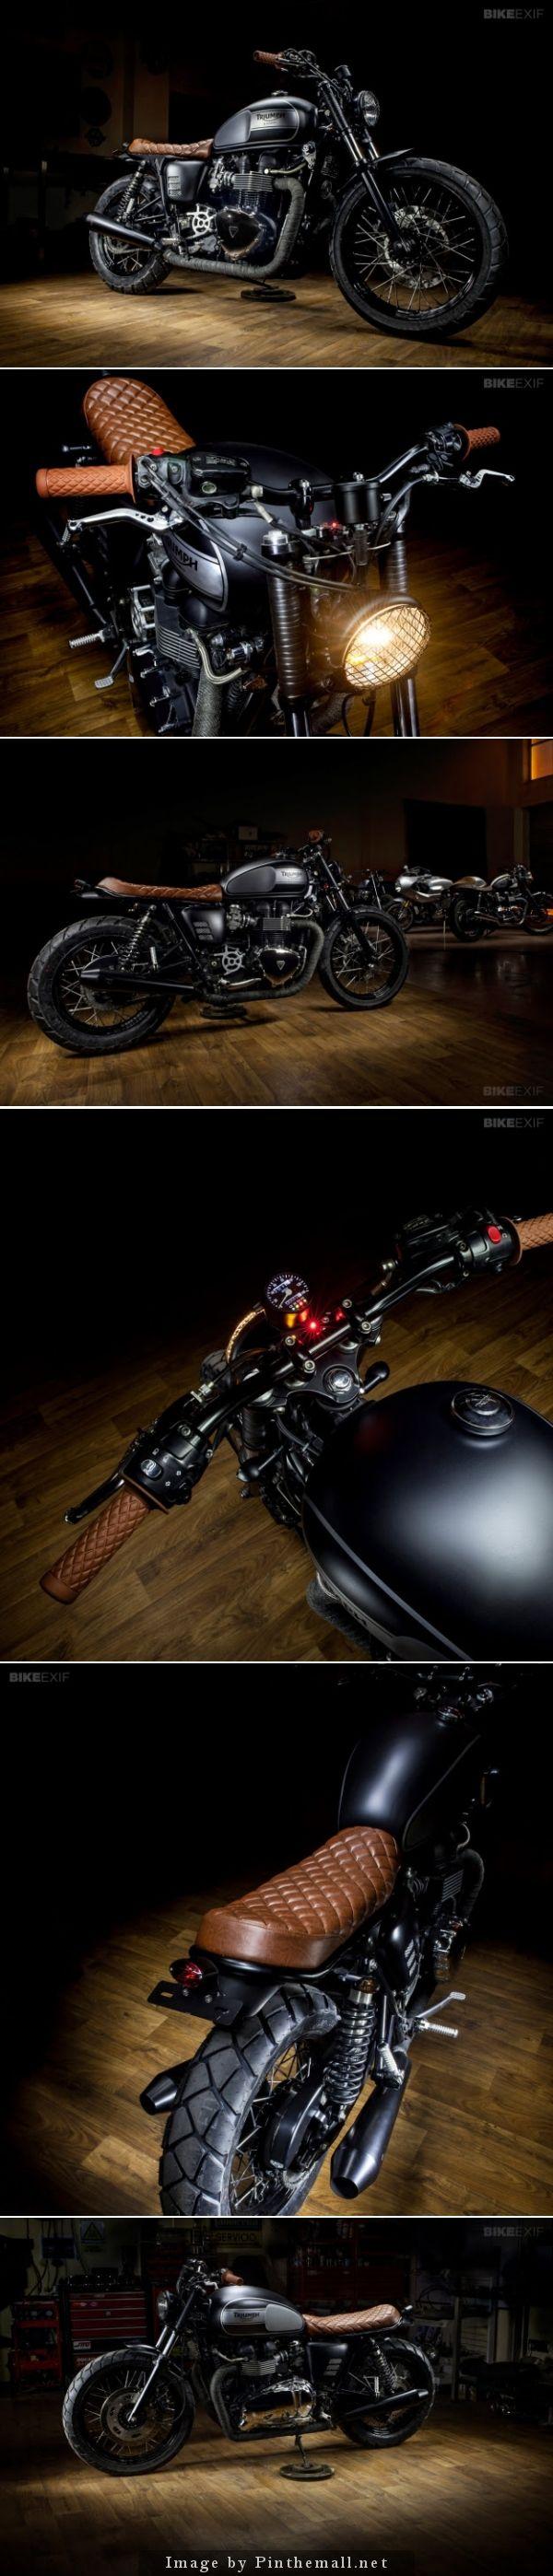 Bonneville T100 by Maccomotors Click to read more about